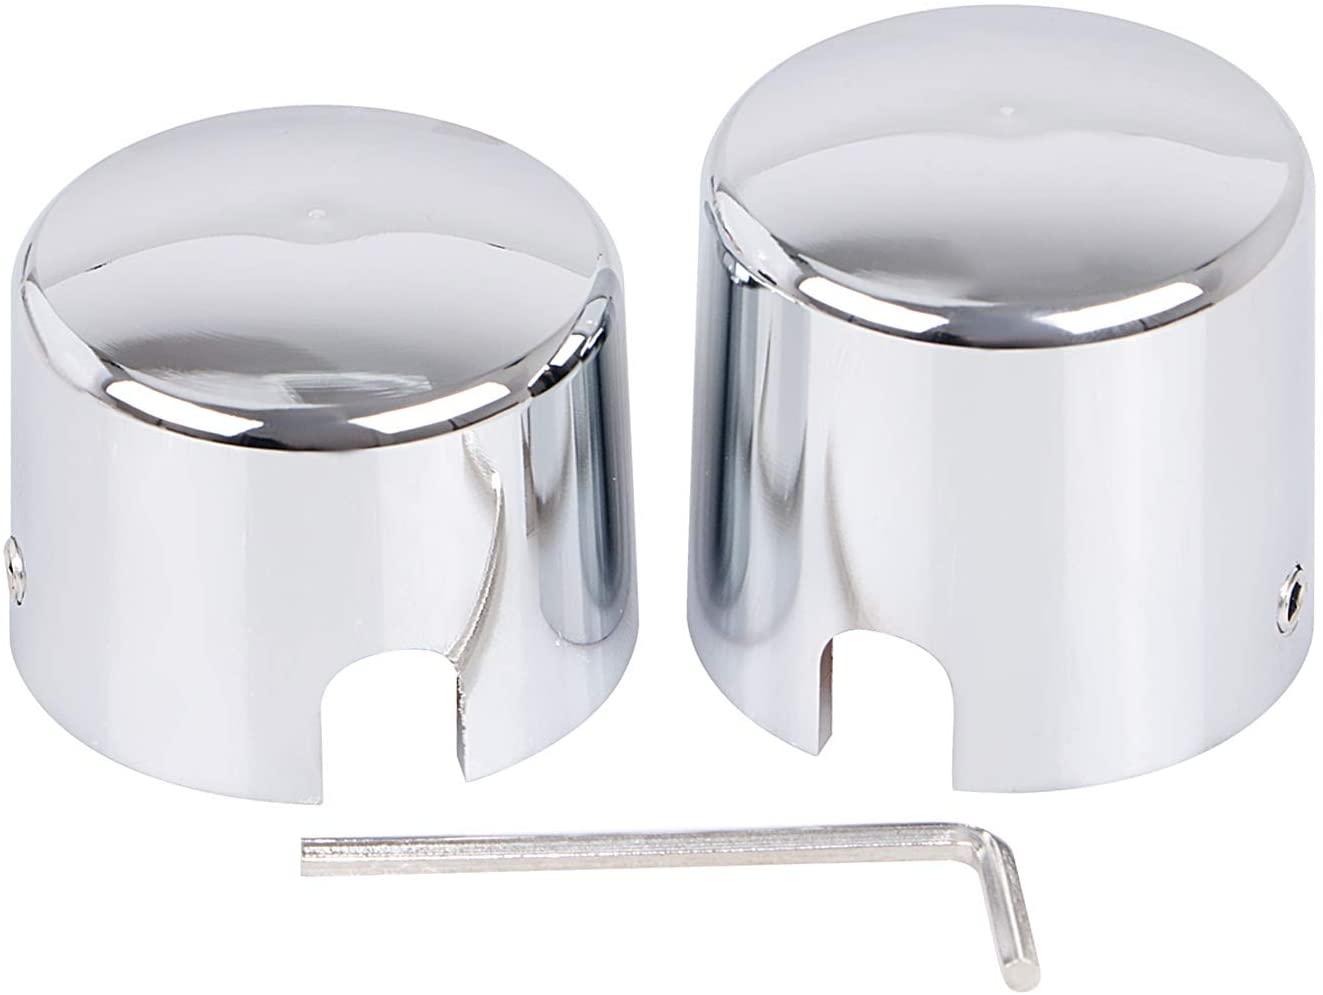 XMMT Pair Chrome Aluminum Rear Axle Nut Caps Cover for Harley-Davidson Softail FLST FXST